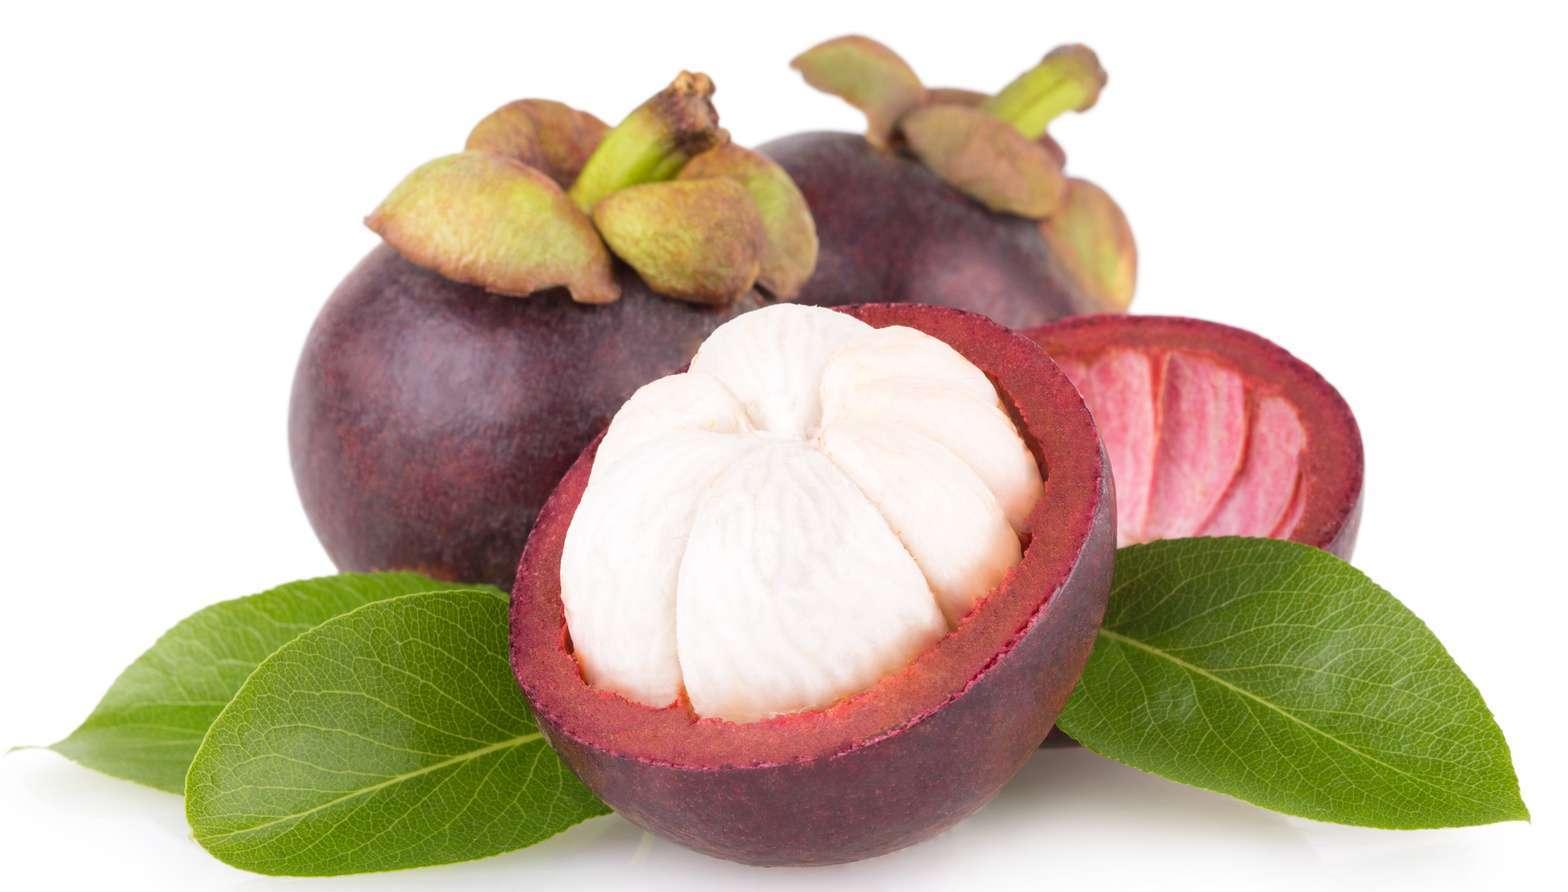 Les meilleurs bienfaits du mangoustan  - أفضل فوائد المانغوستين فاكهه استوائيه